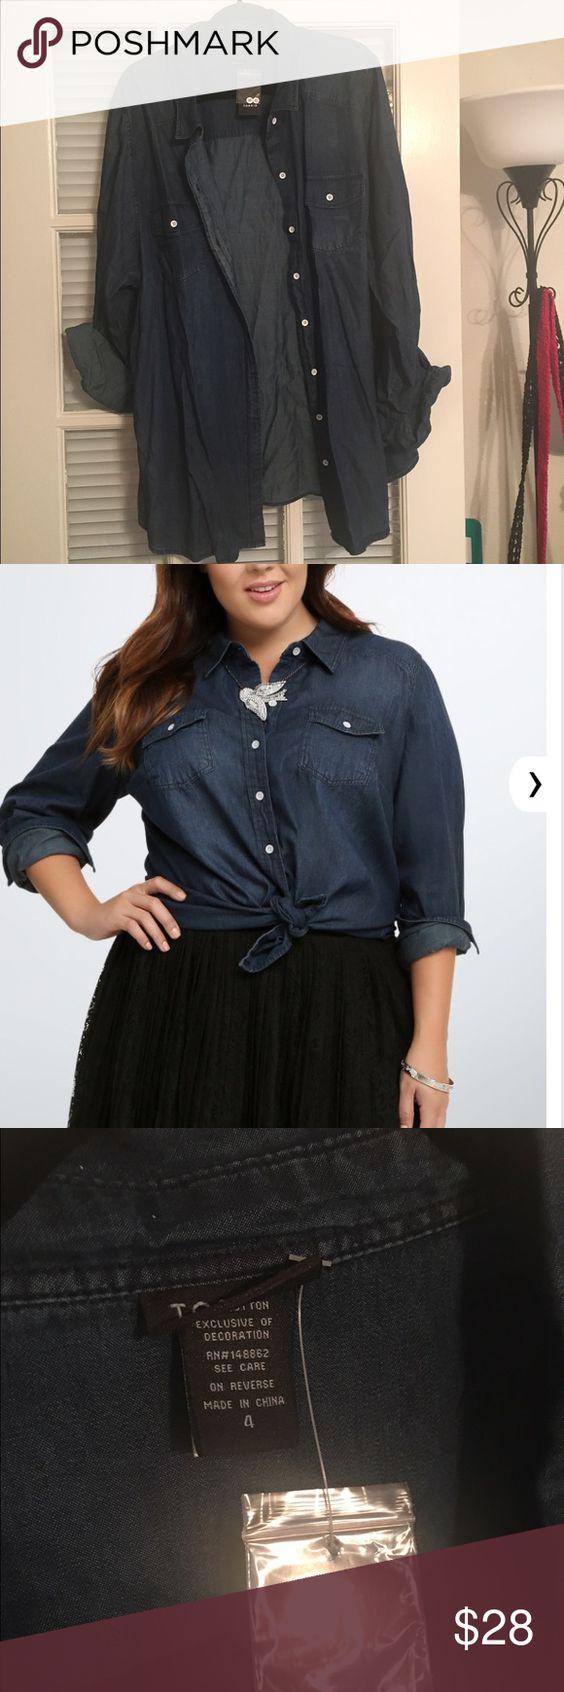 Torrid Size 4 denim shirt Torrid Size 4 denim shirt torrid Tops Button Down Shirts